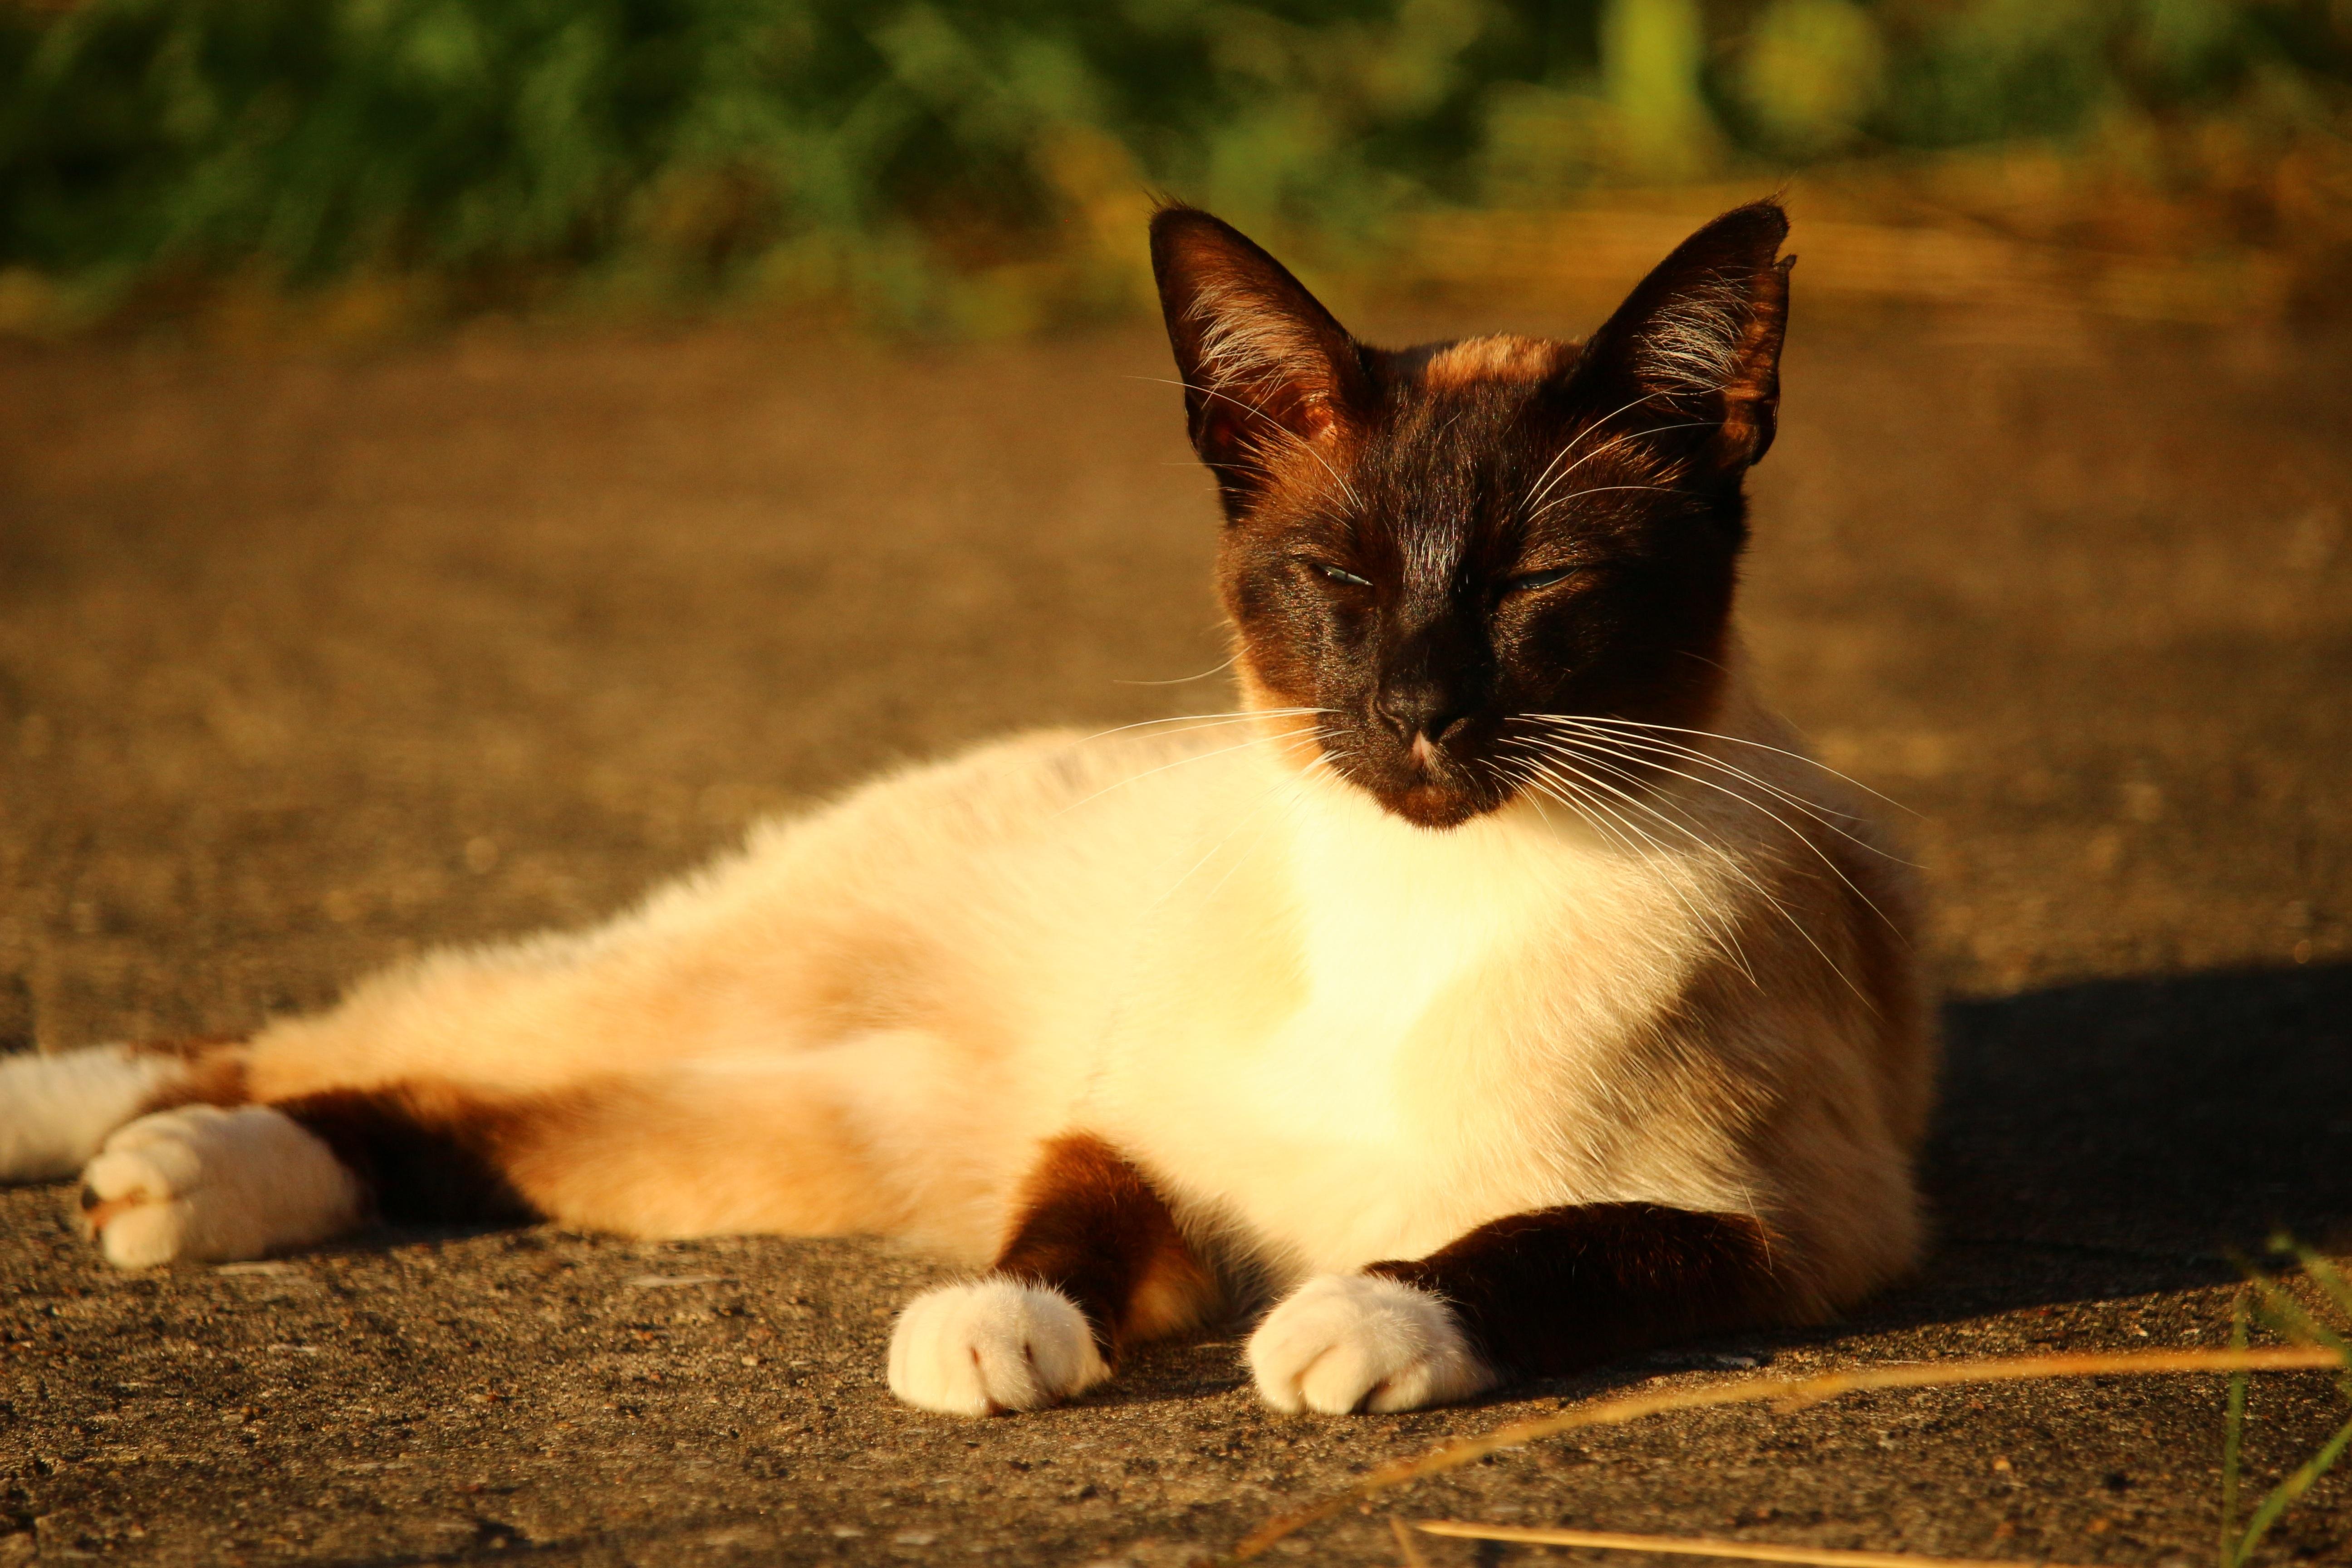 Free kitten fauna siam whiskers vertebrate siamese